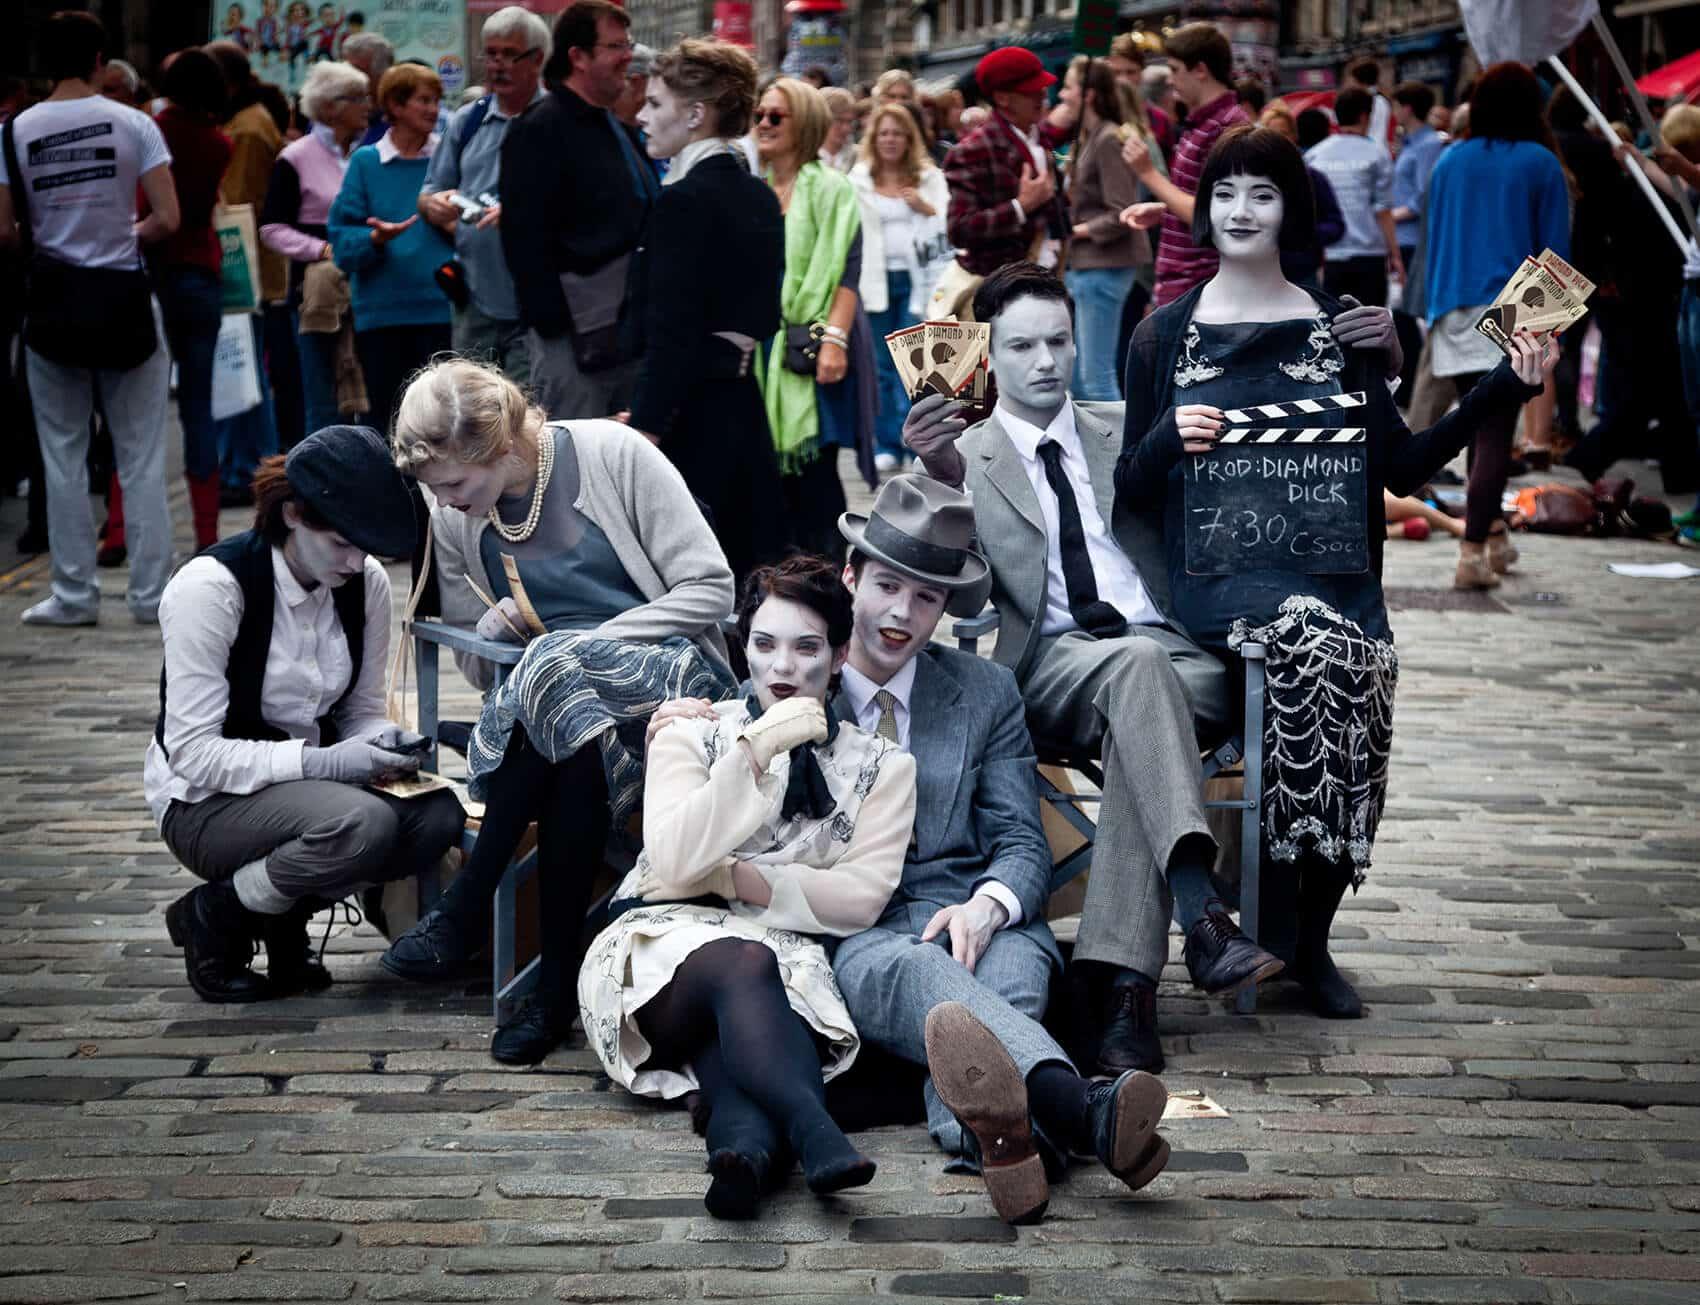 Fringe-Festival-Edinburgh-street-performers-870127-by-Luxstorm-via-pixabay-Public-Domain